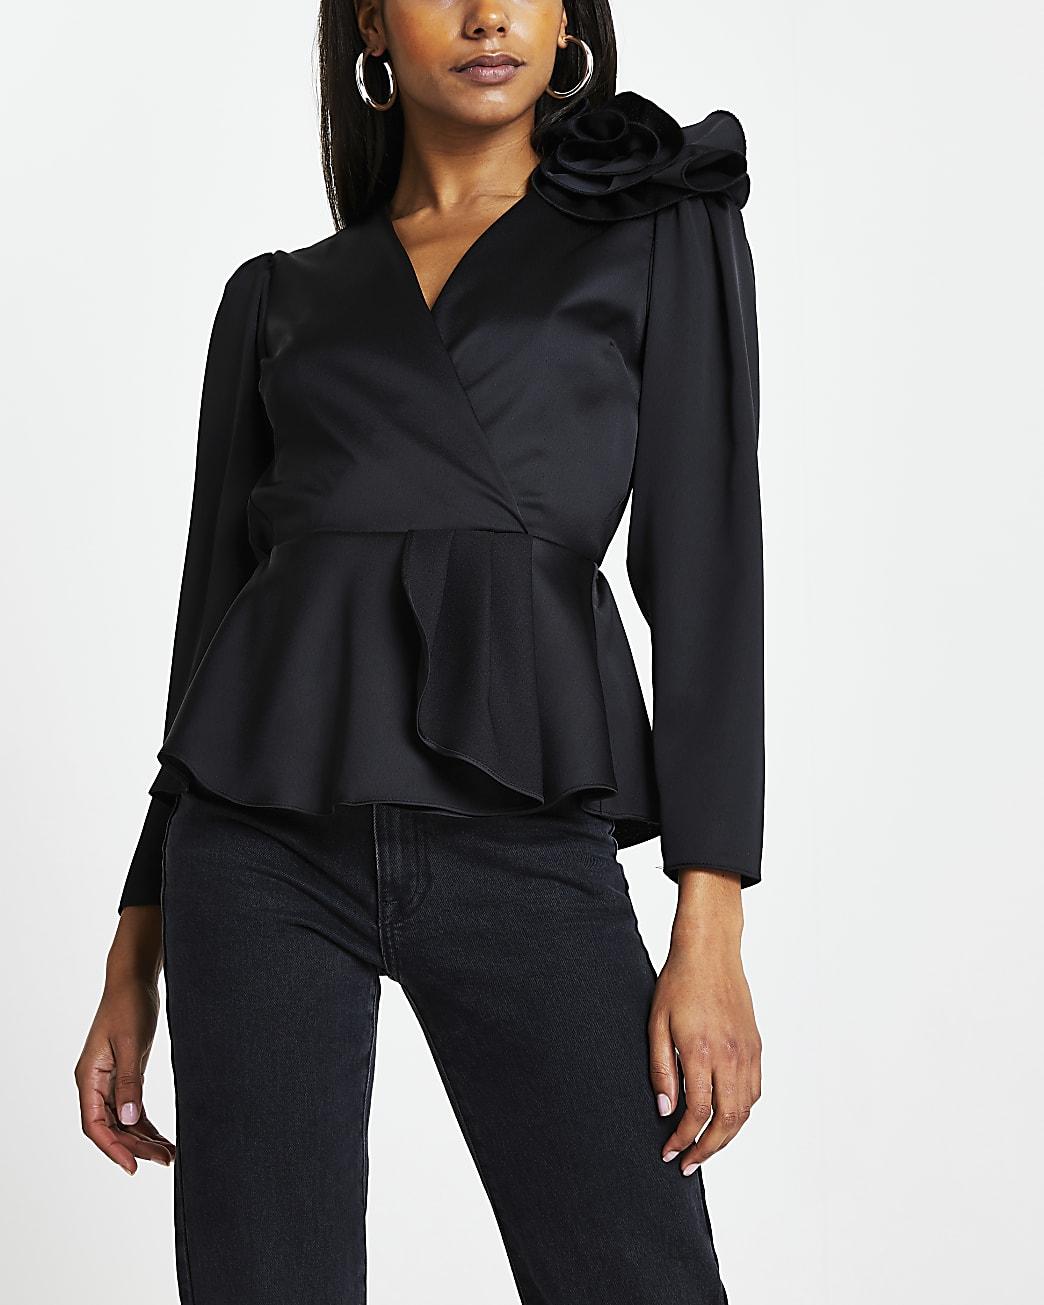 Black peplum corsage wrap top